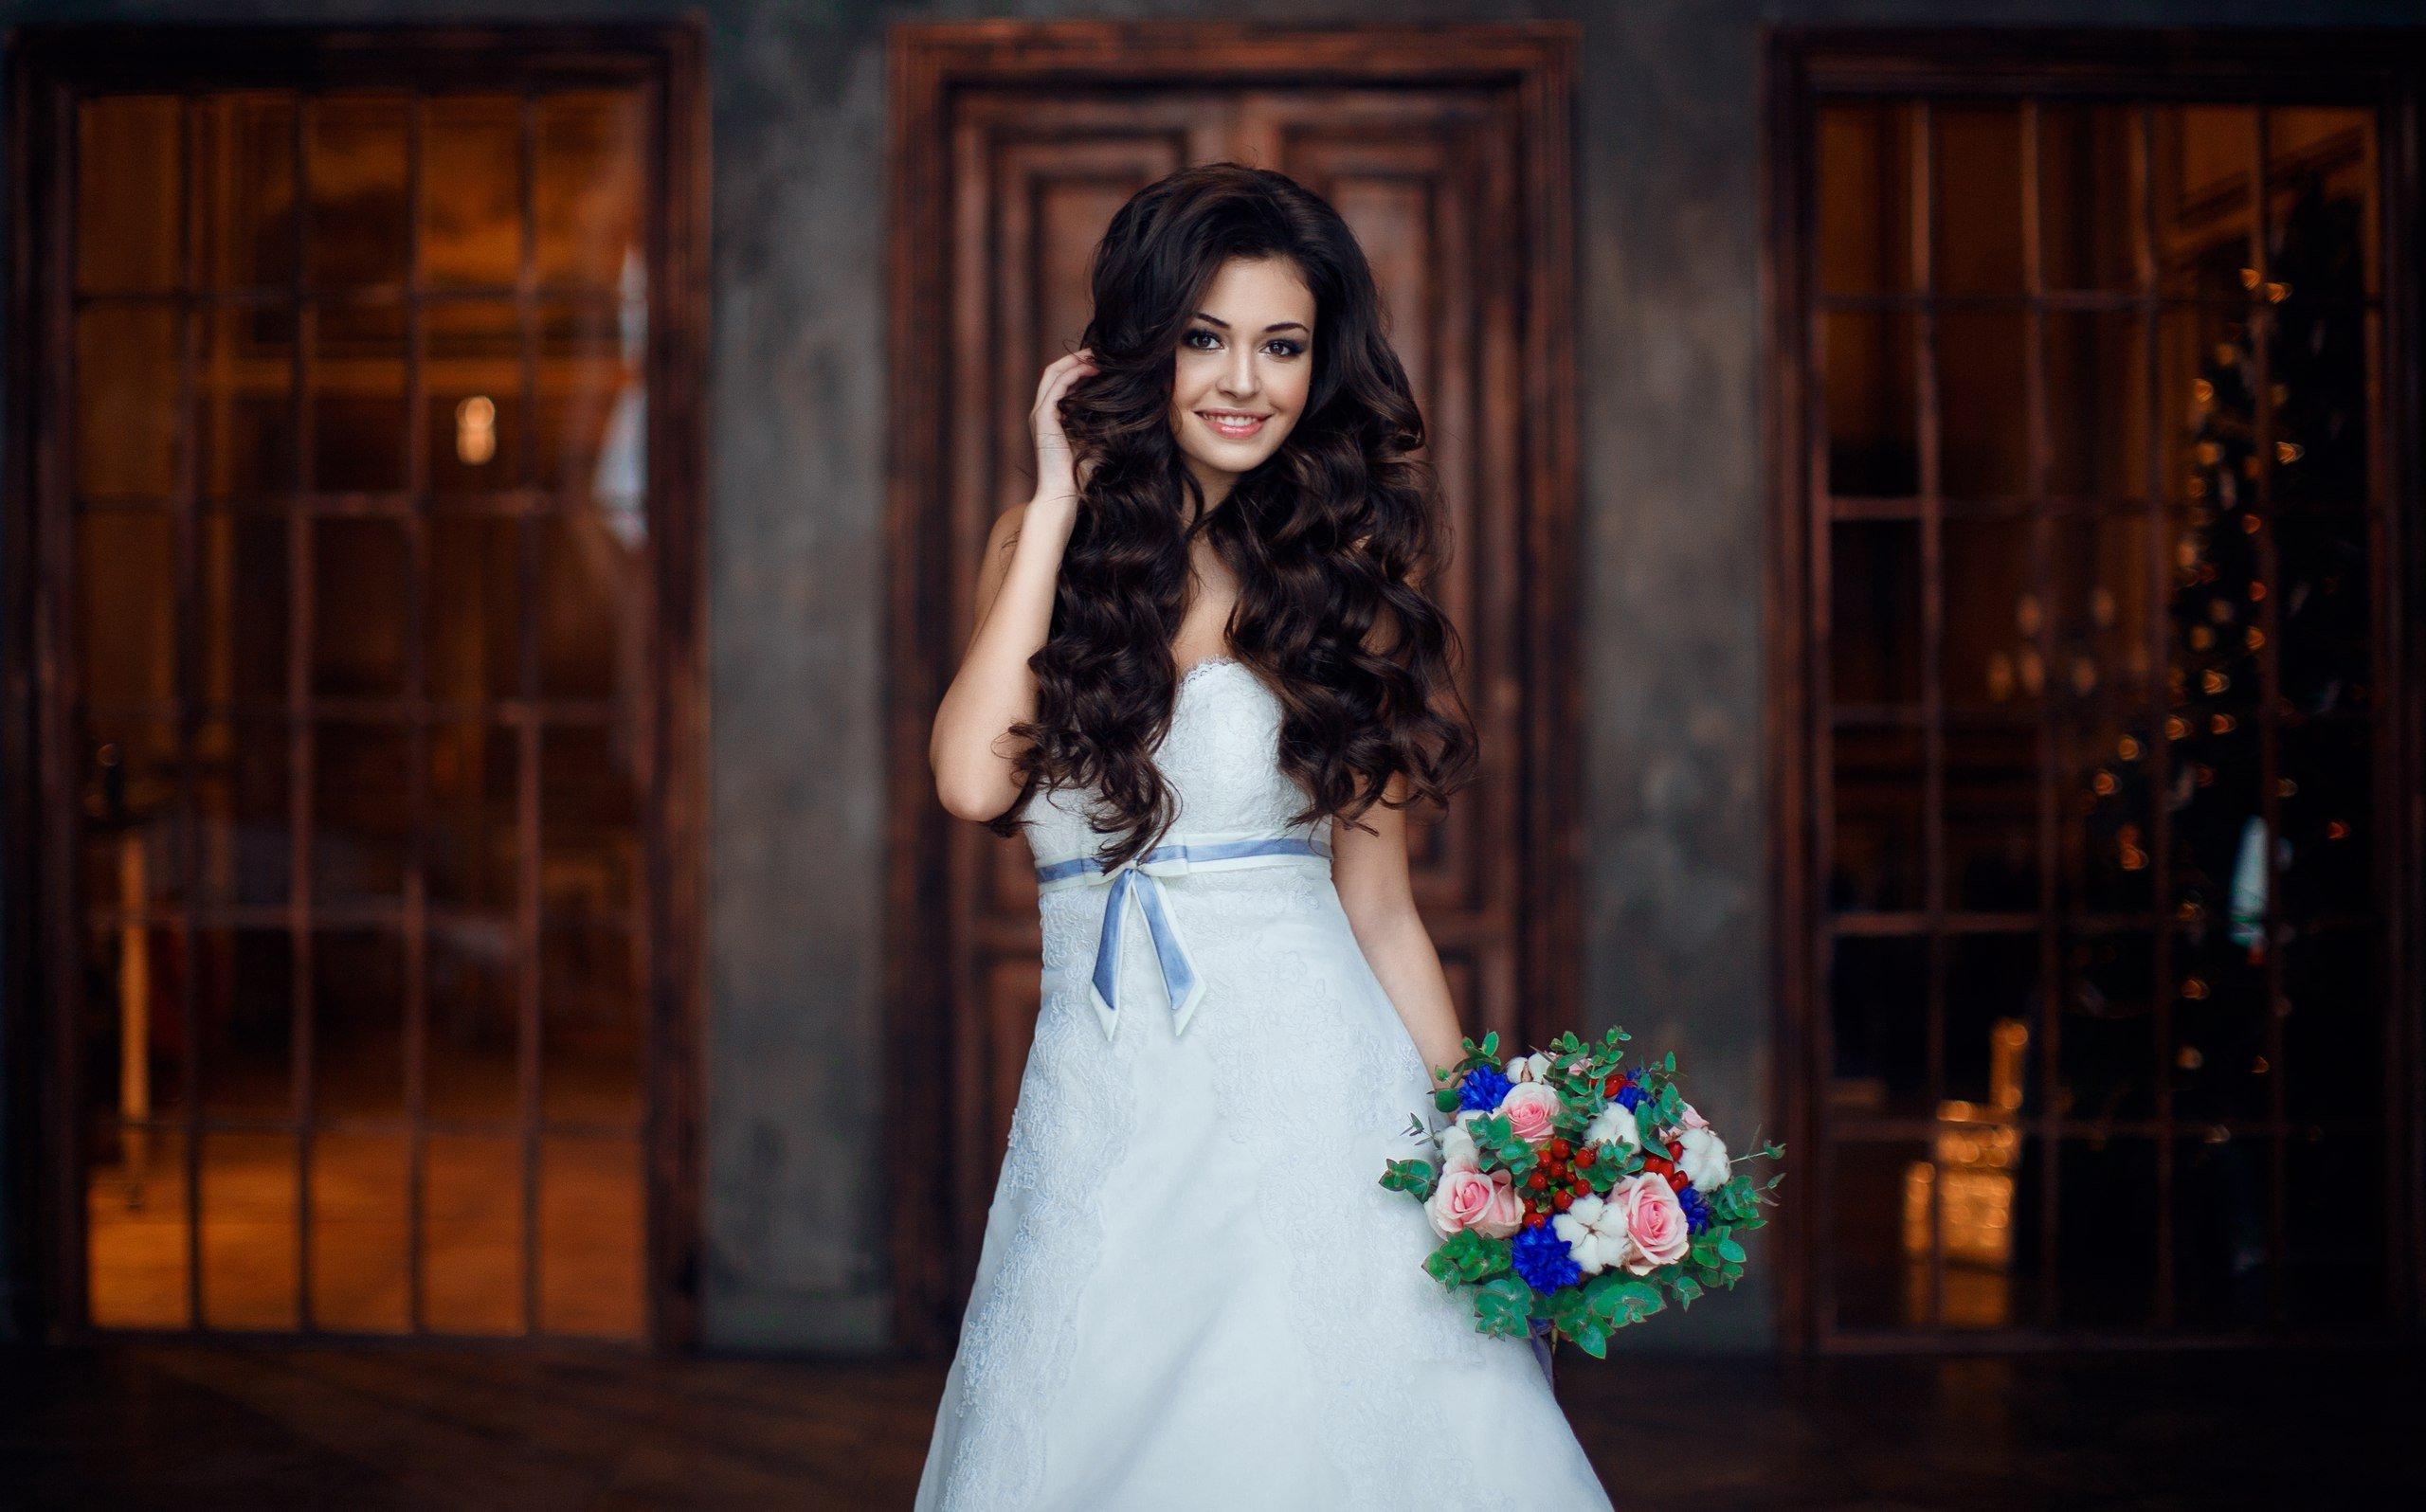 Woman Female Long Hair Beautiful Girl Bridal Wedding Dress Smile Wallpaper 2560x1596 913377 Wallpaperup: Wedding Dress With Long Hair At Reisefeber.org